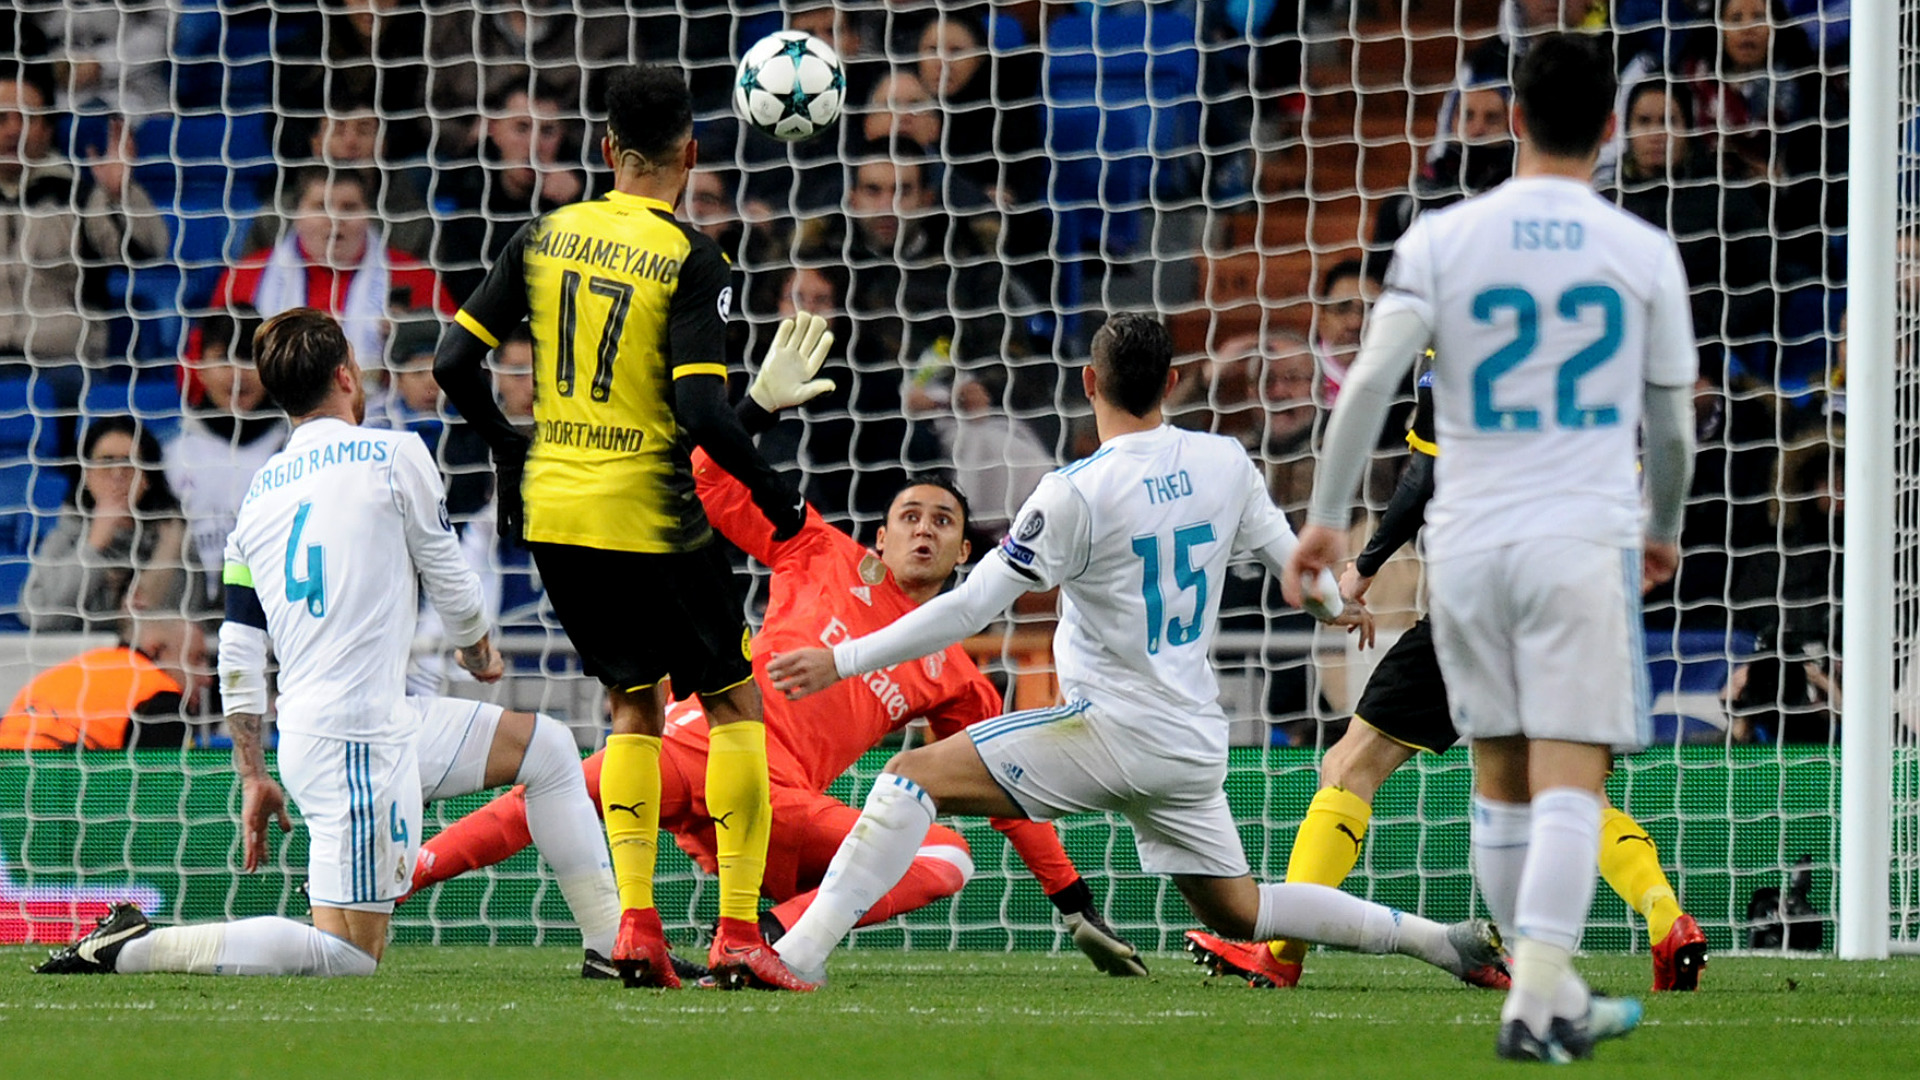 Aubameyang Keylor Navas Real Madrid Borussia Dortmund UEFA Champions League